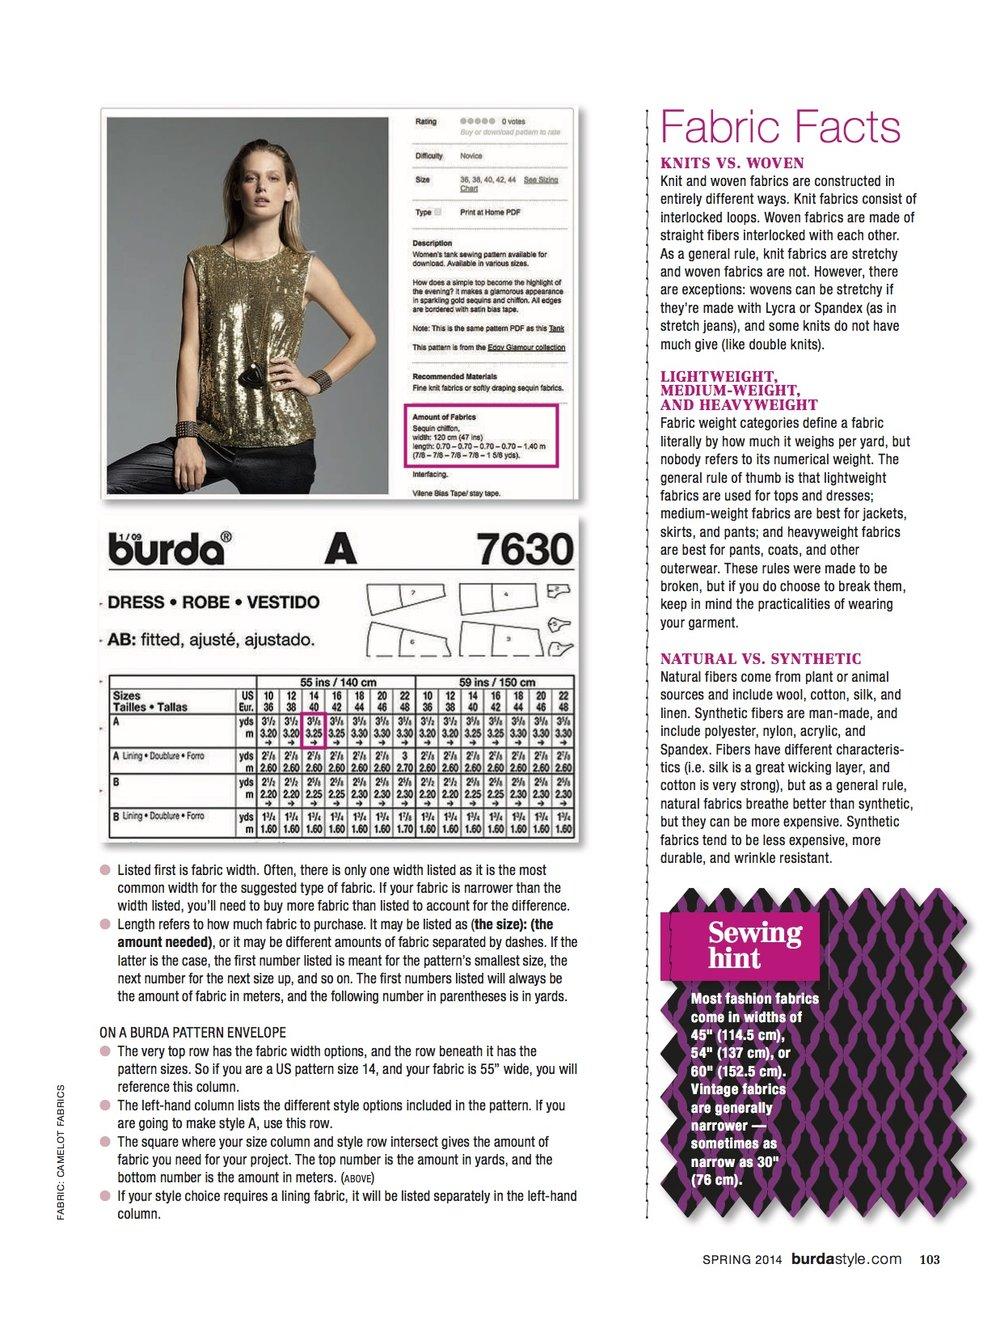 Sewing_Basics_Spring2014_Amanda_Kaufmann2.jpg